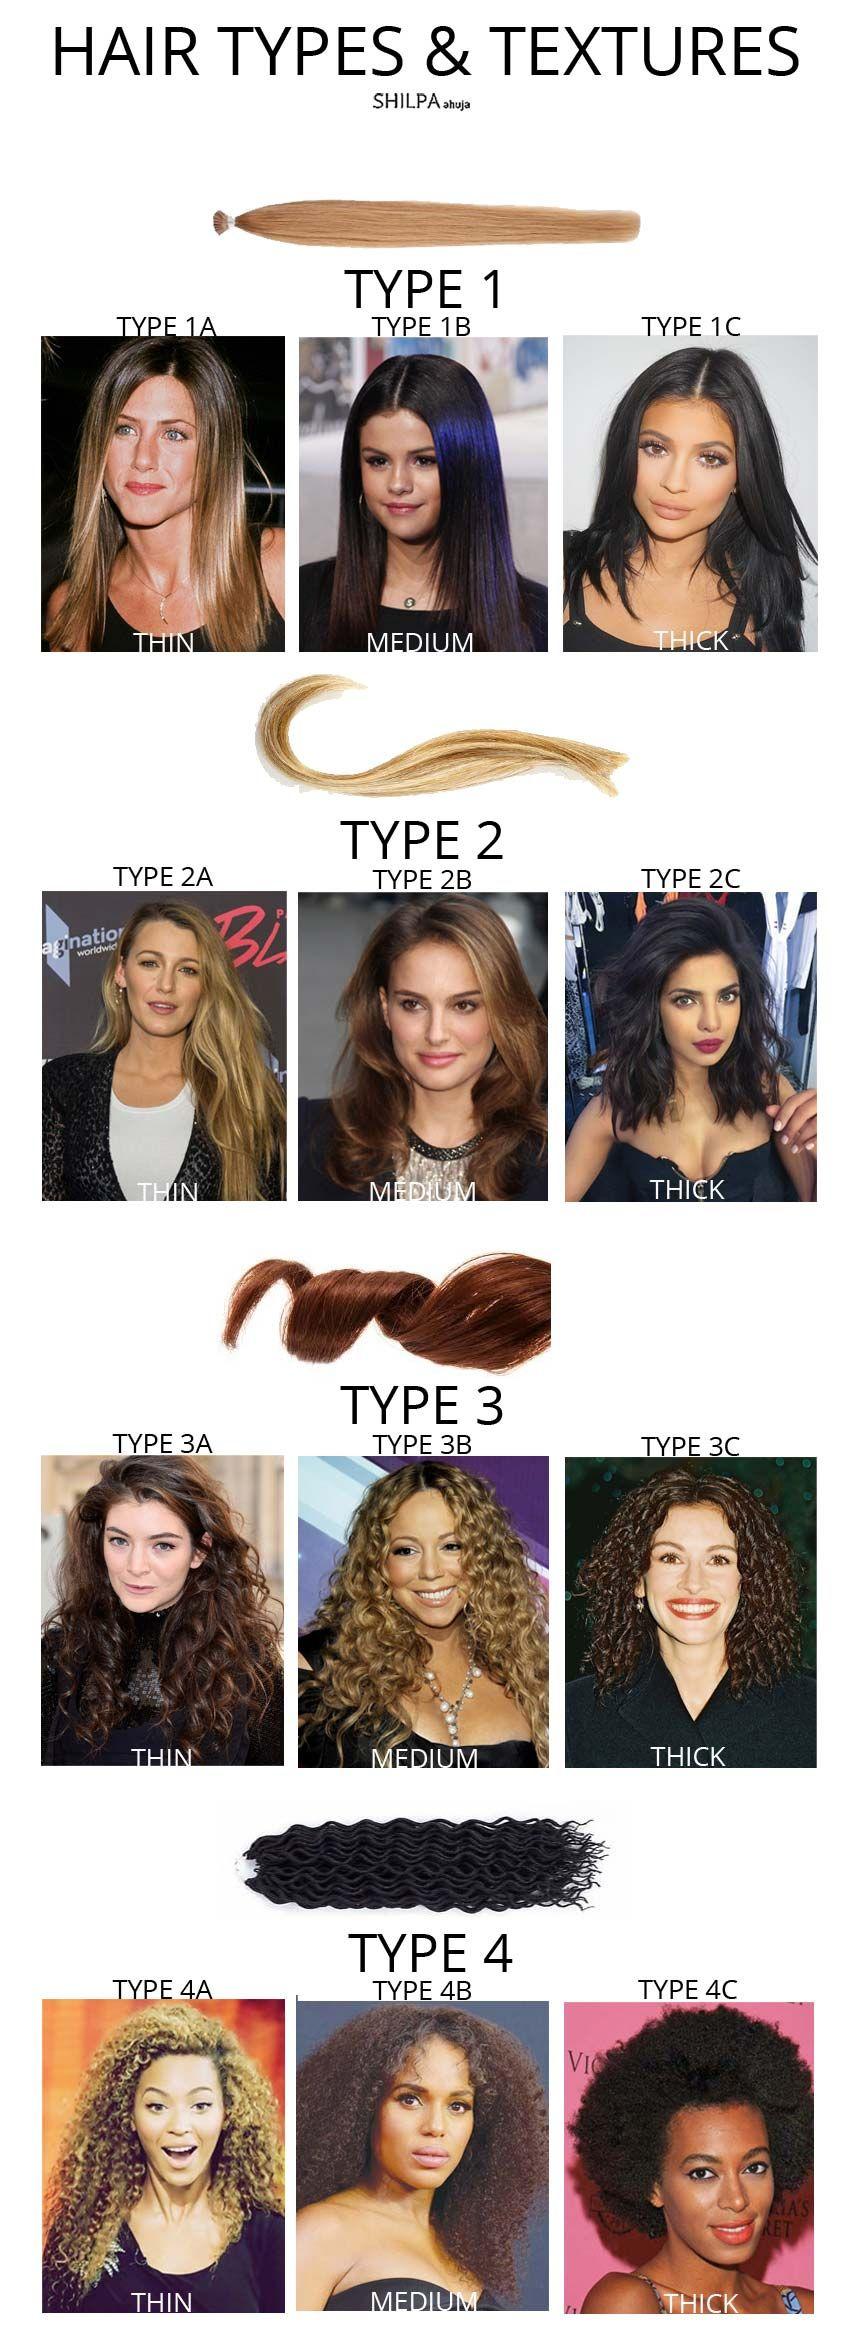 Natural Hair Types With Our No Fail Hair Texture Chart Natural Hair Types Hair Type Chart Hair Texture Chart